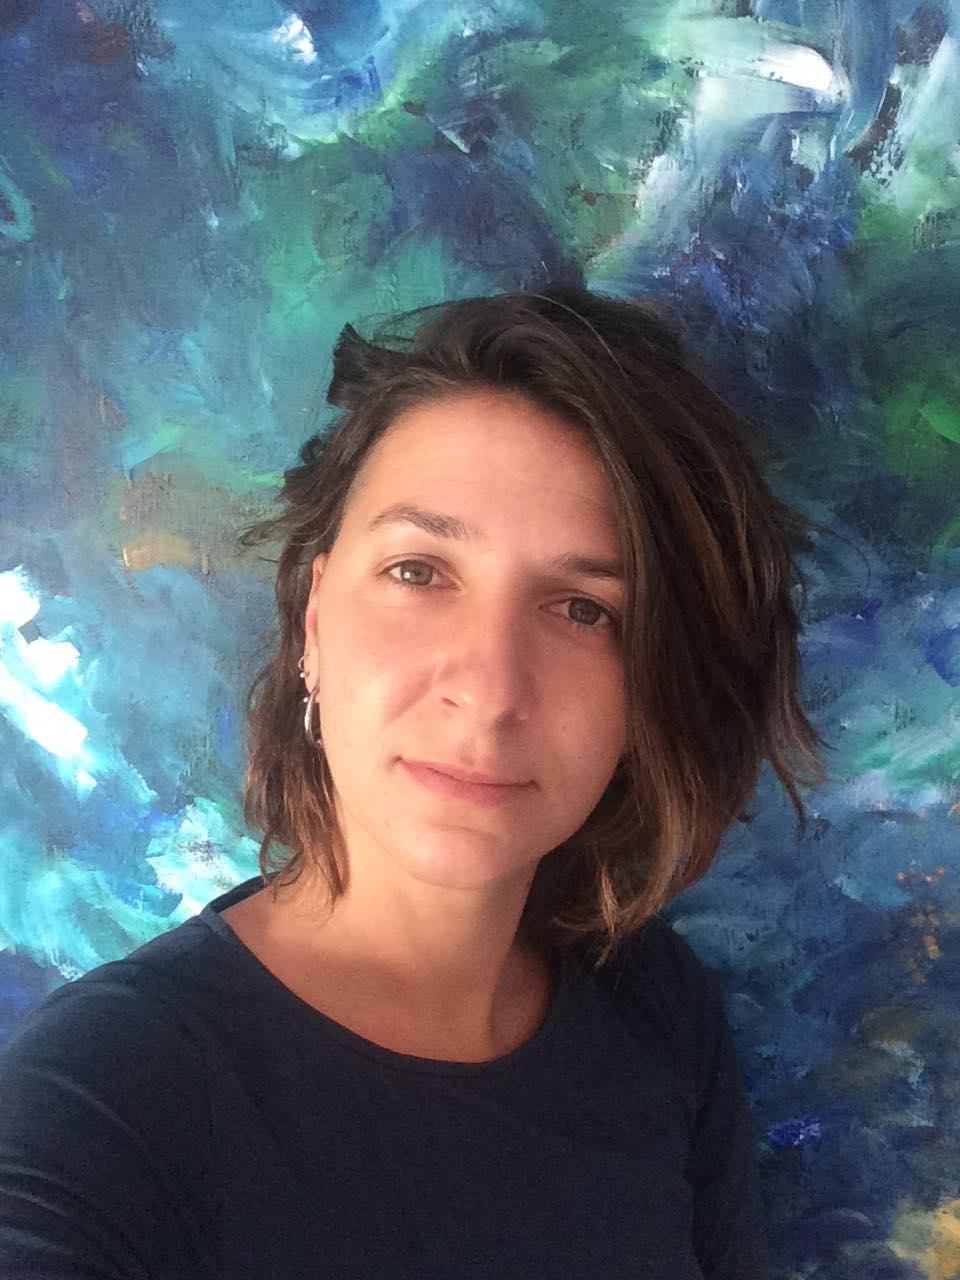 COLABORADORES: PATRICIA FREIRE